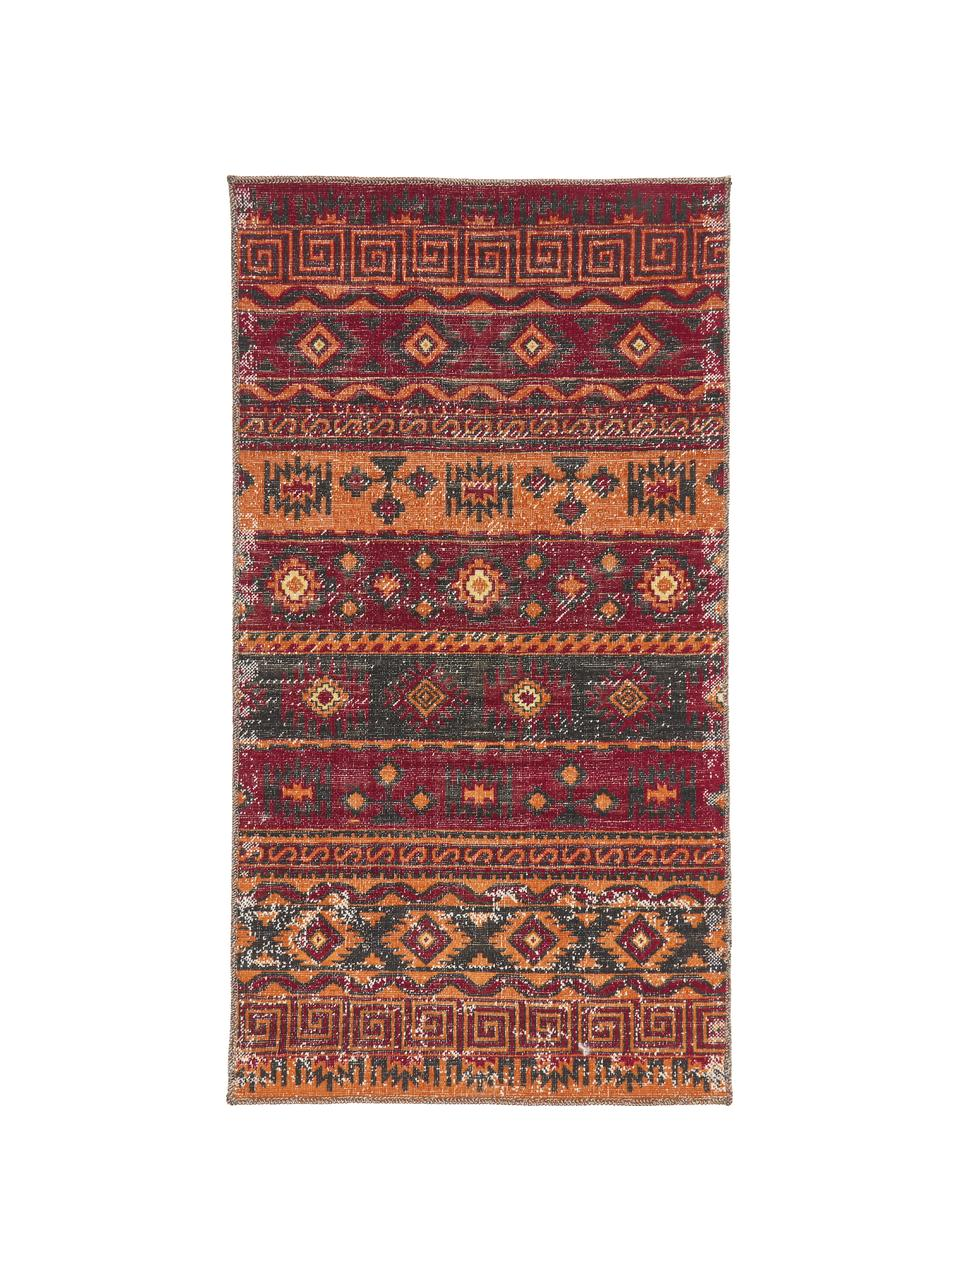 In- & outdoor vloerkleed Tilas Istanbul in donkerrood, Orient Style, 100% polypropyleen, Donkerrood, mosterdgeel, kakikleurig, B 120 x L 170 cm (maat S)